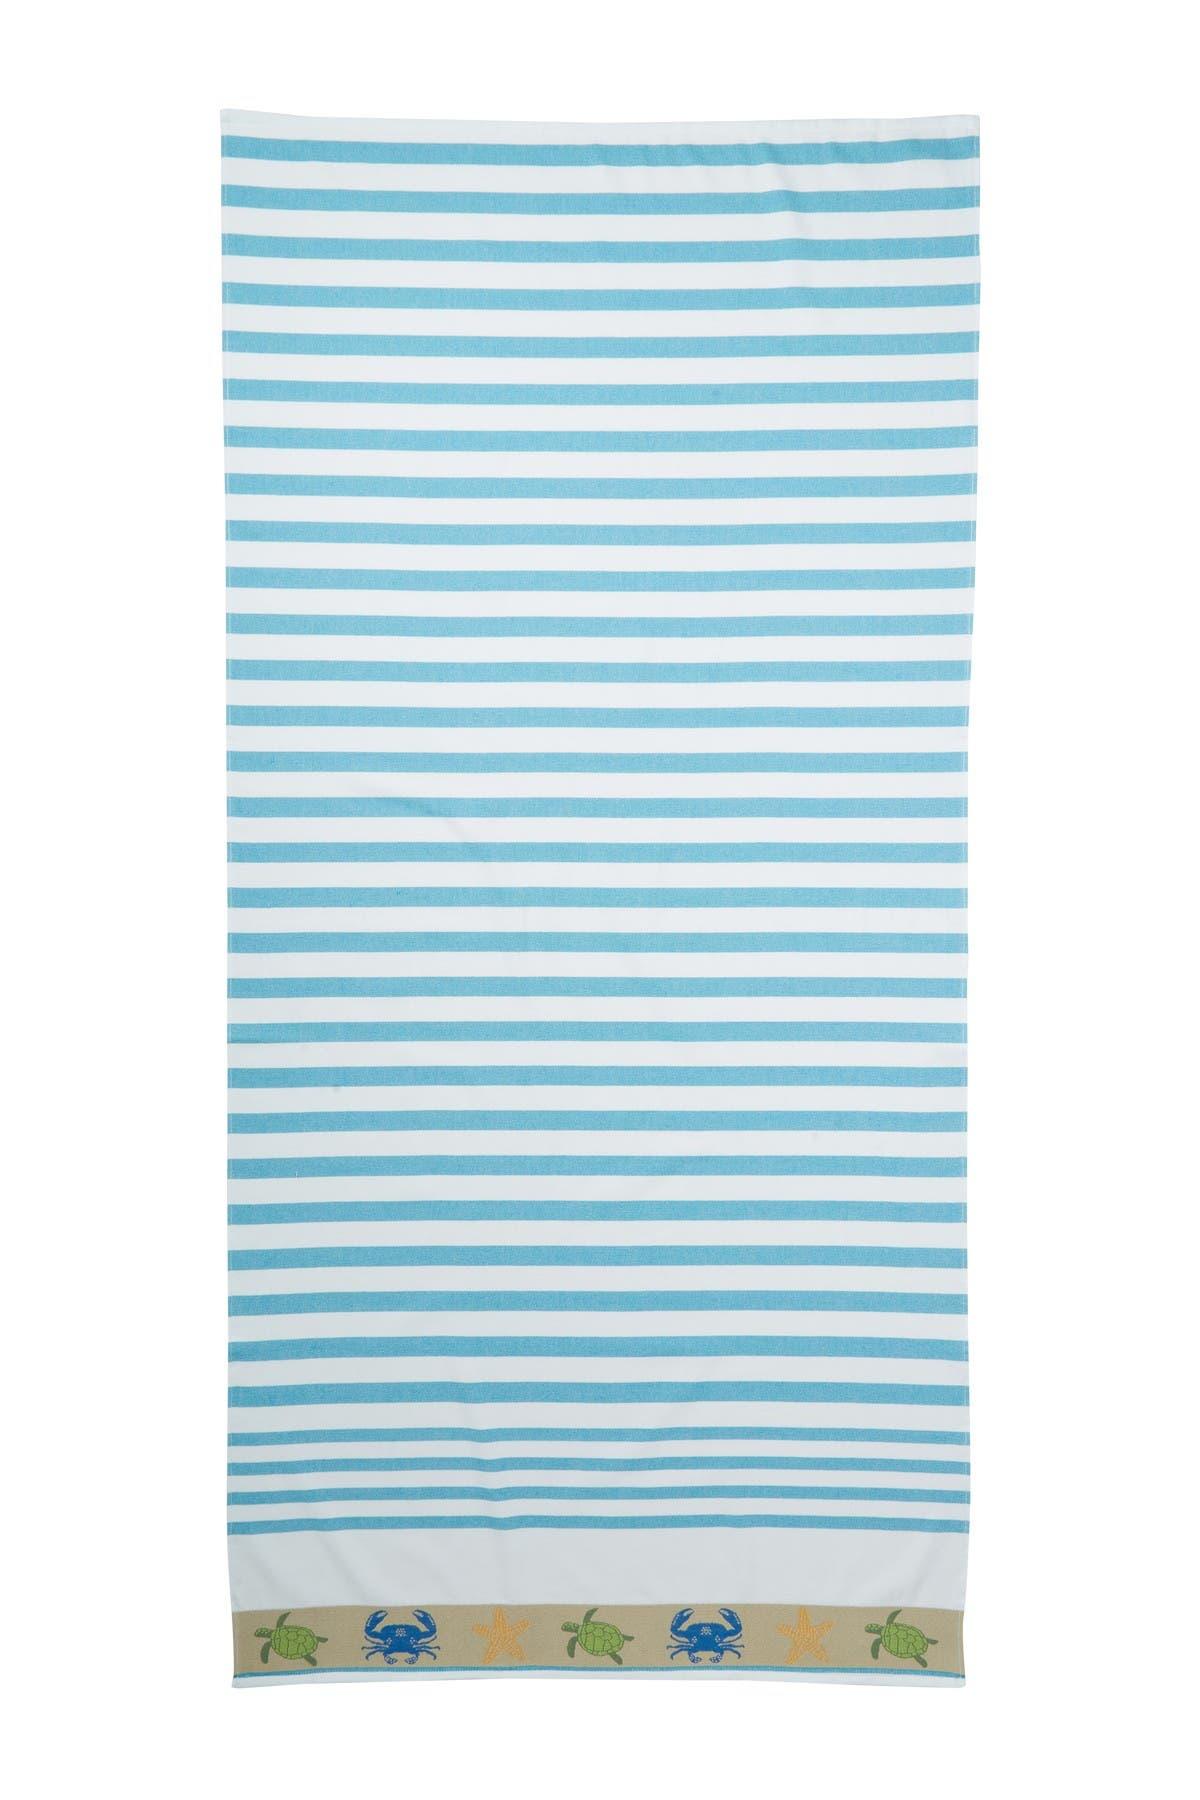 Image of Apollo Towels Vanguard Oceanic Border Beach Towel - Turquoise